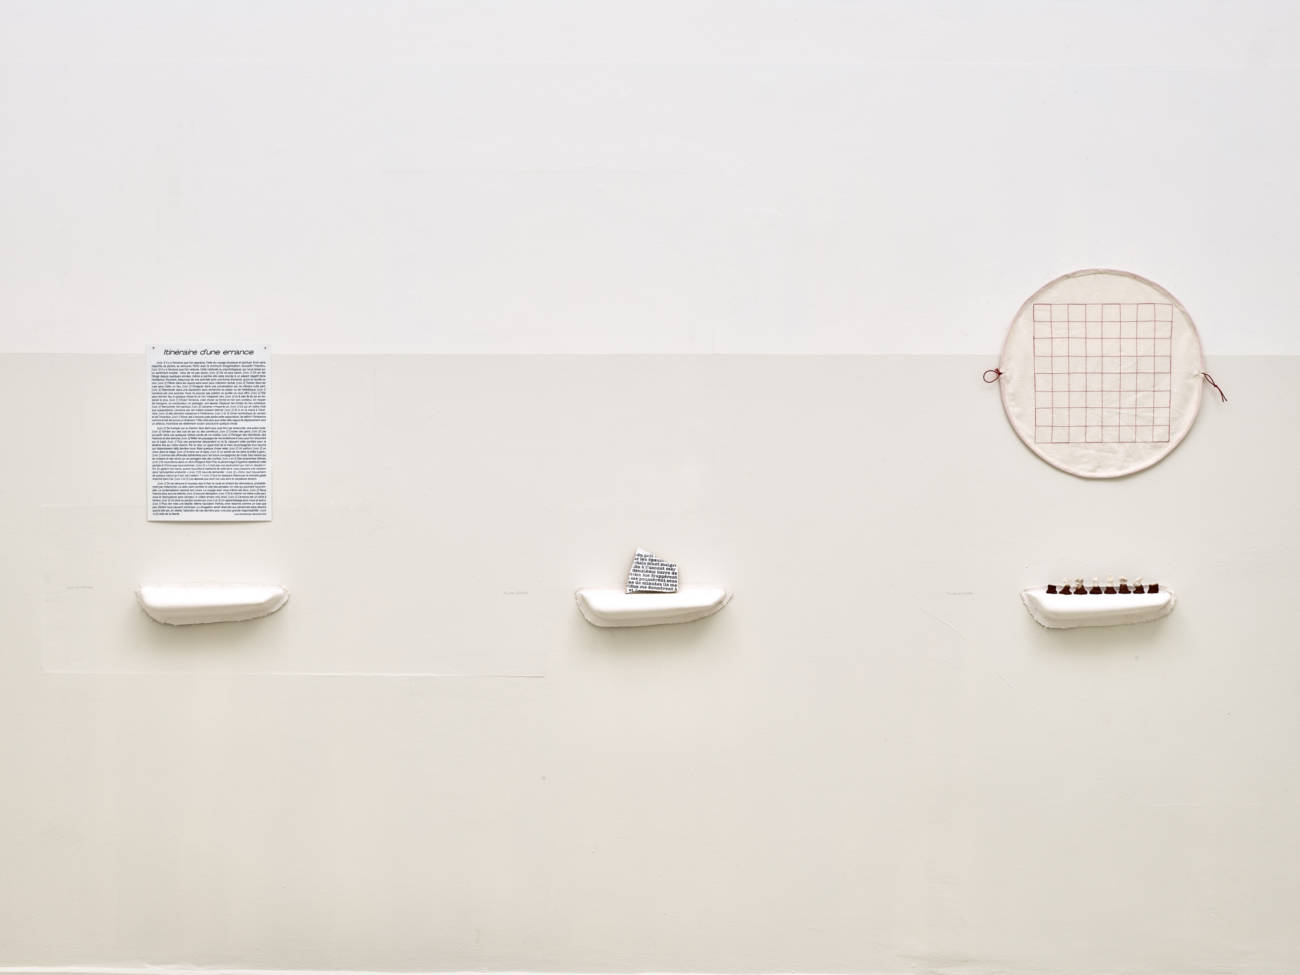 © Projet Nomade, Galerie Eva Vautier, 2021, Photo François Fernandez